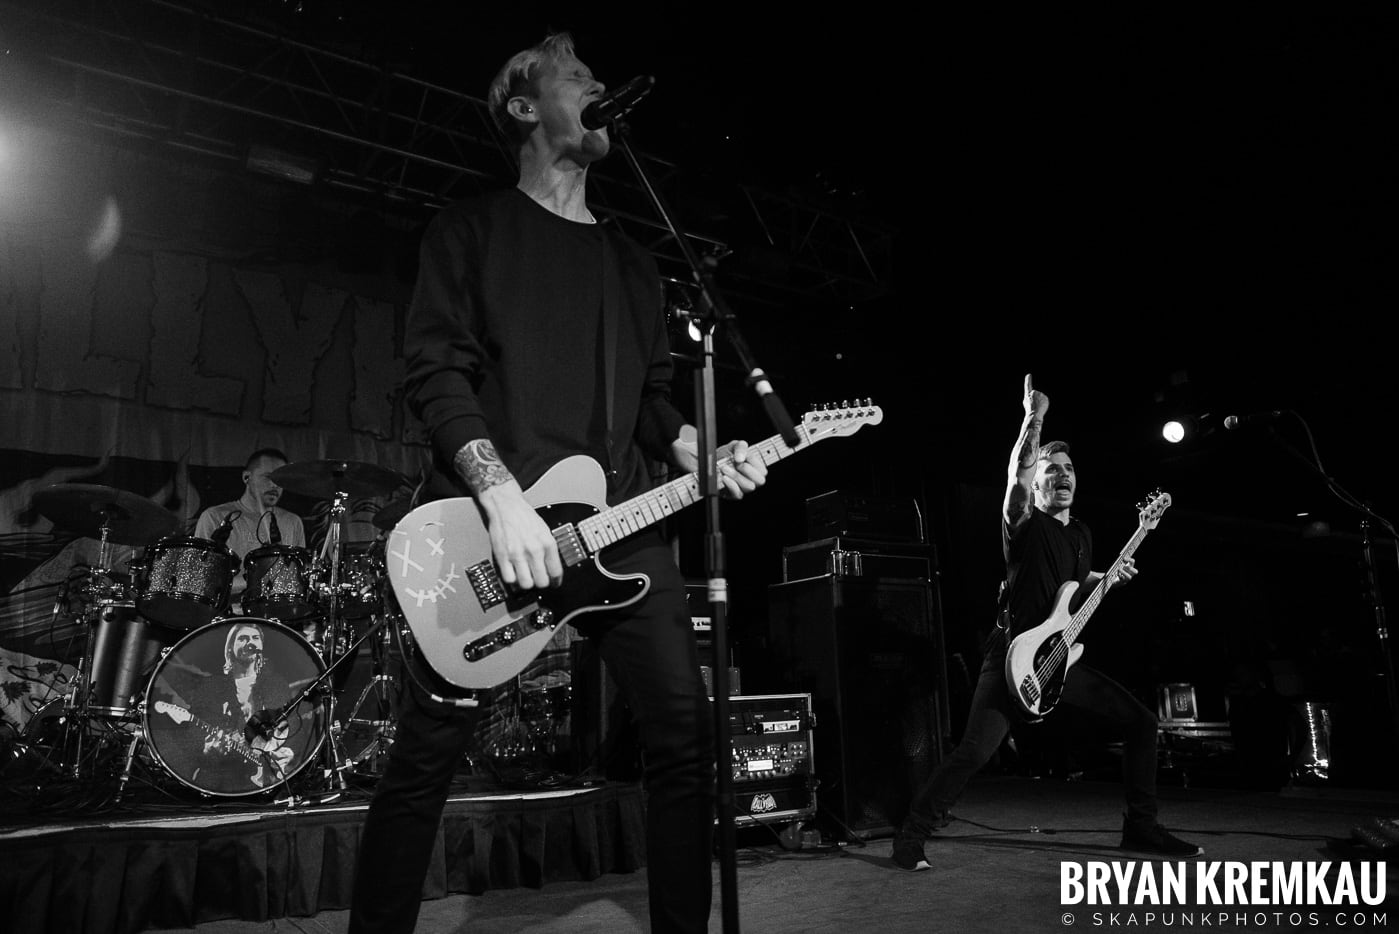 Ballyhoo! @ Starland Ballroom, Sayreville, NJ - 11.23.18 (13)